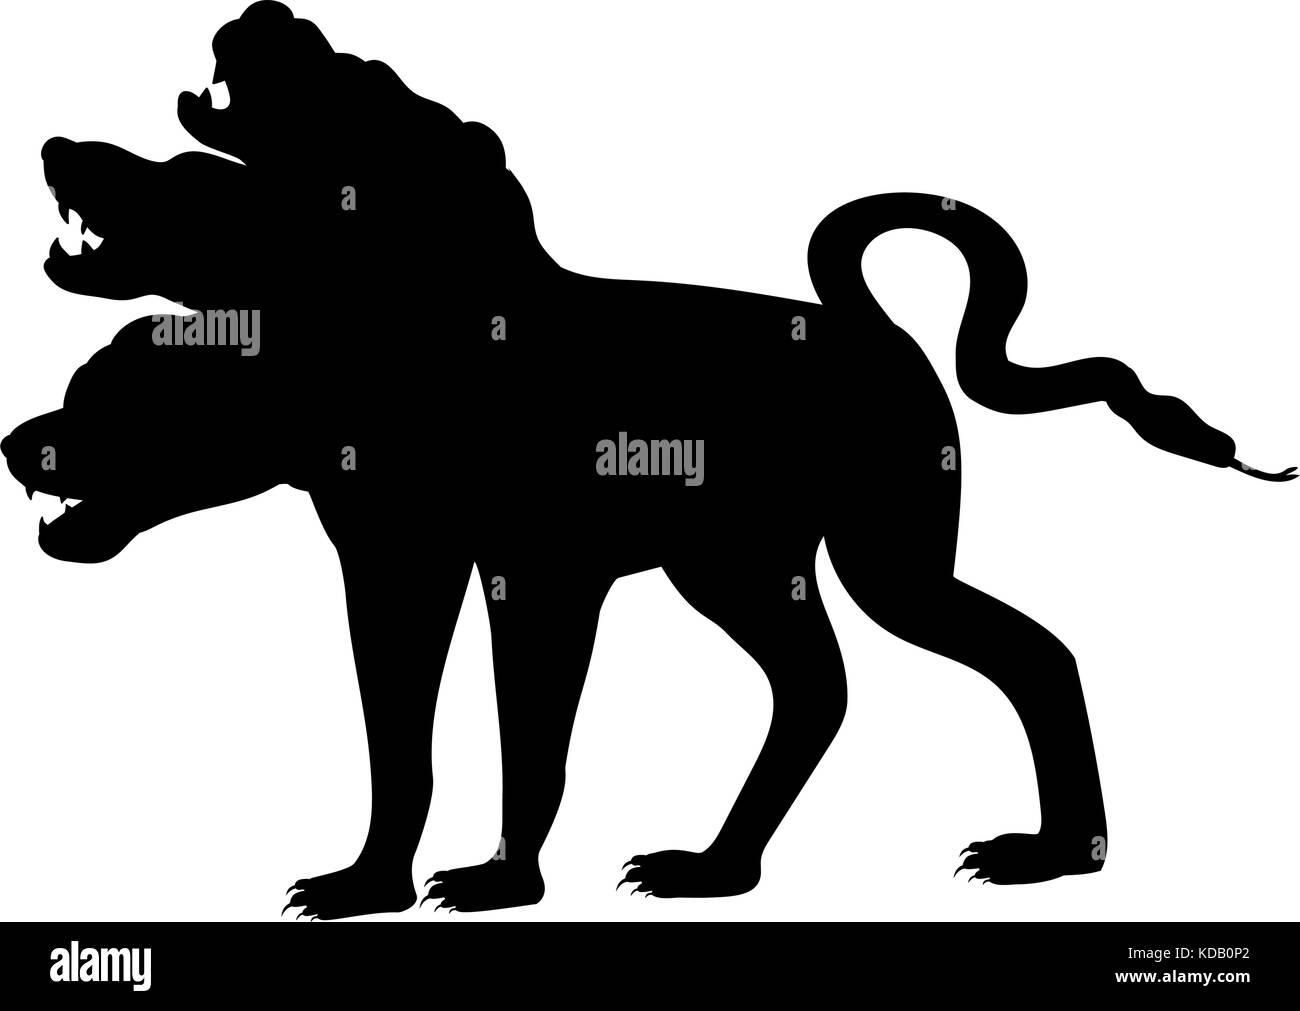 Cerberus Dog Stock Photos Cerberus Dog Stock Images Alamy